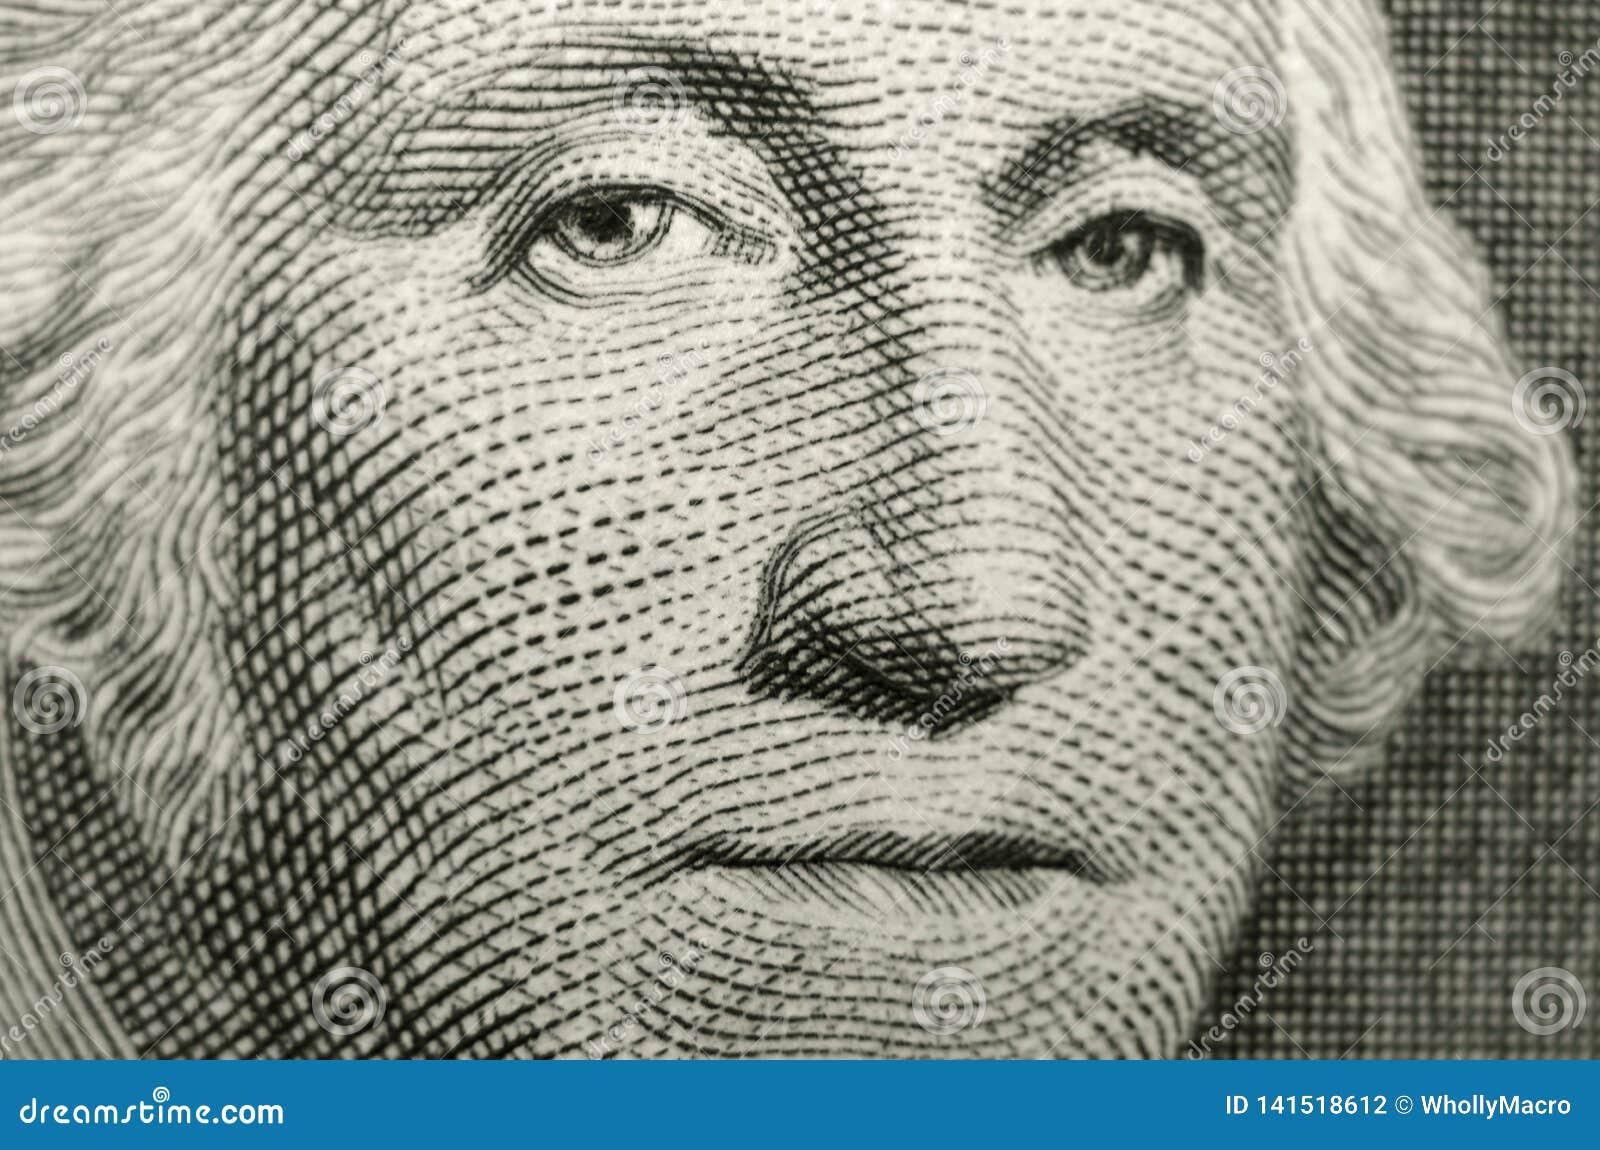 Shallow focus image of United States of America founding father, president George Washington.